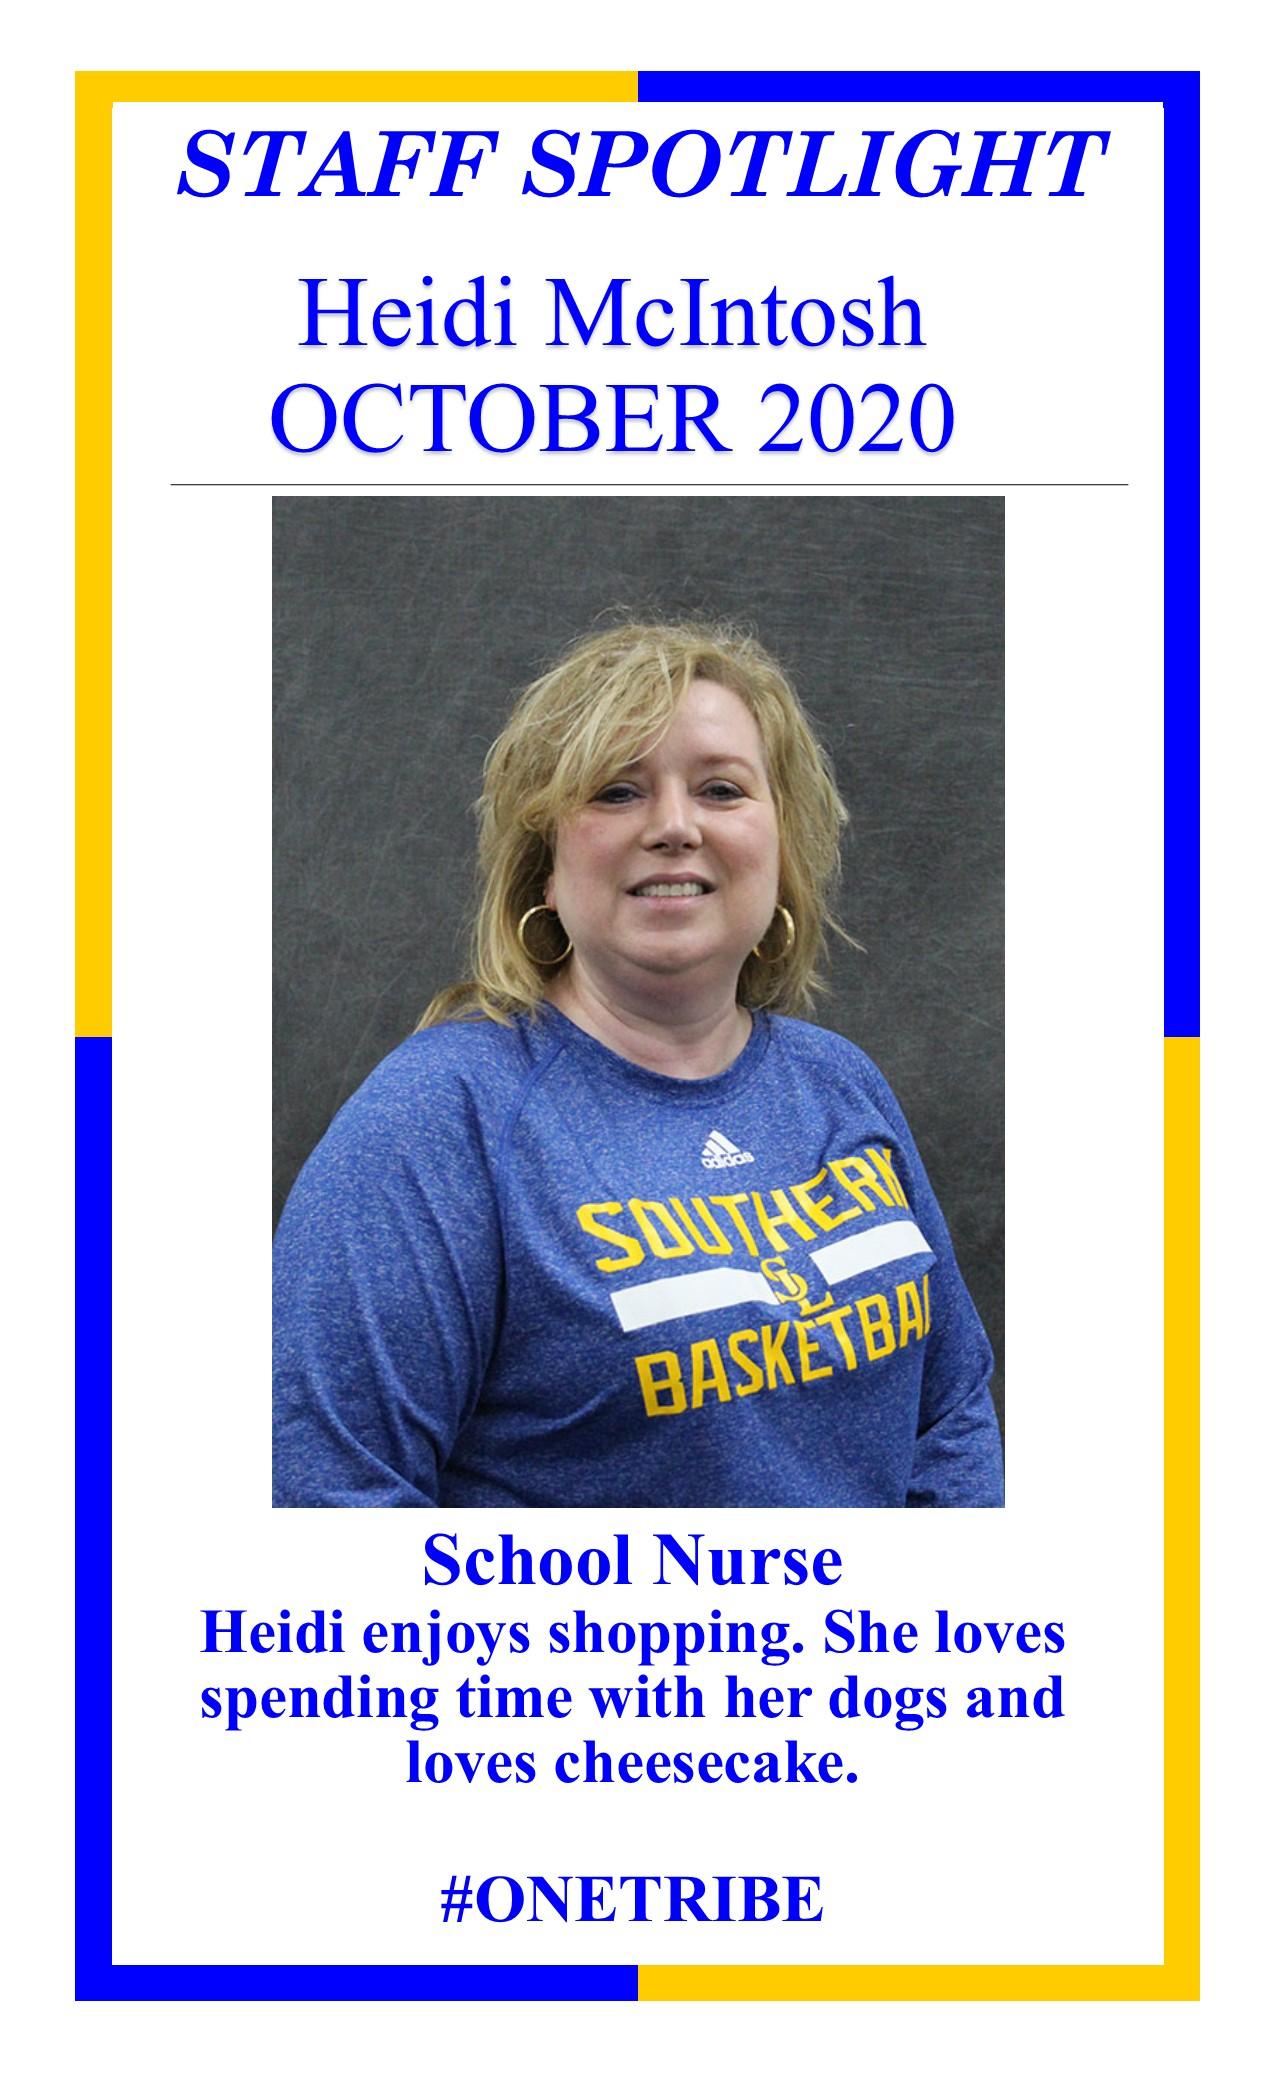 Nurse Heidi McIntosh